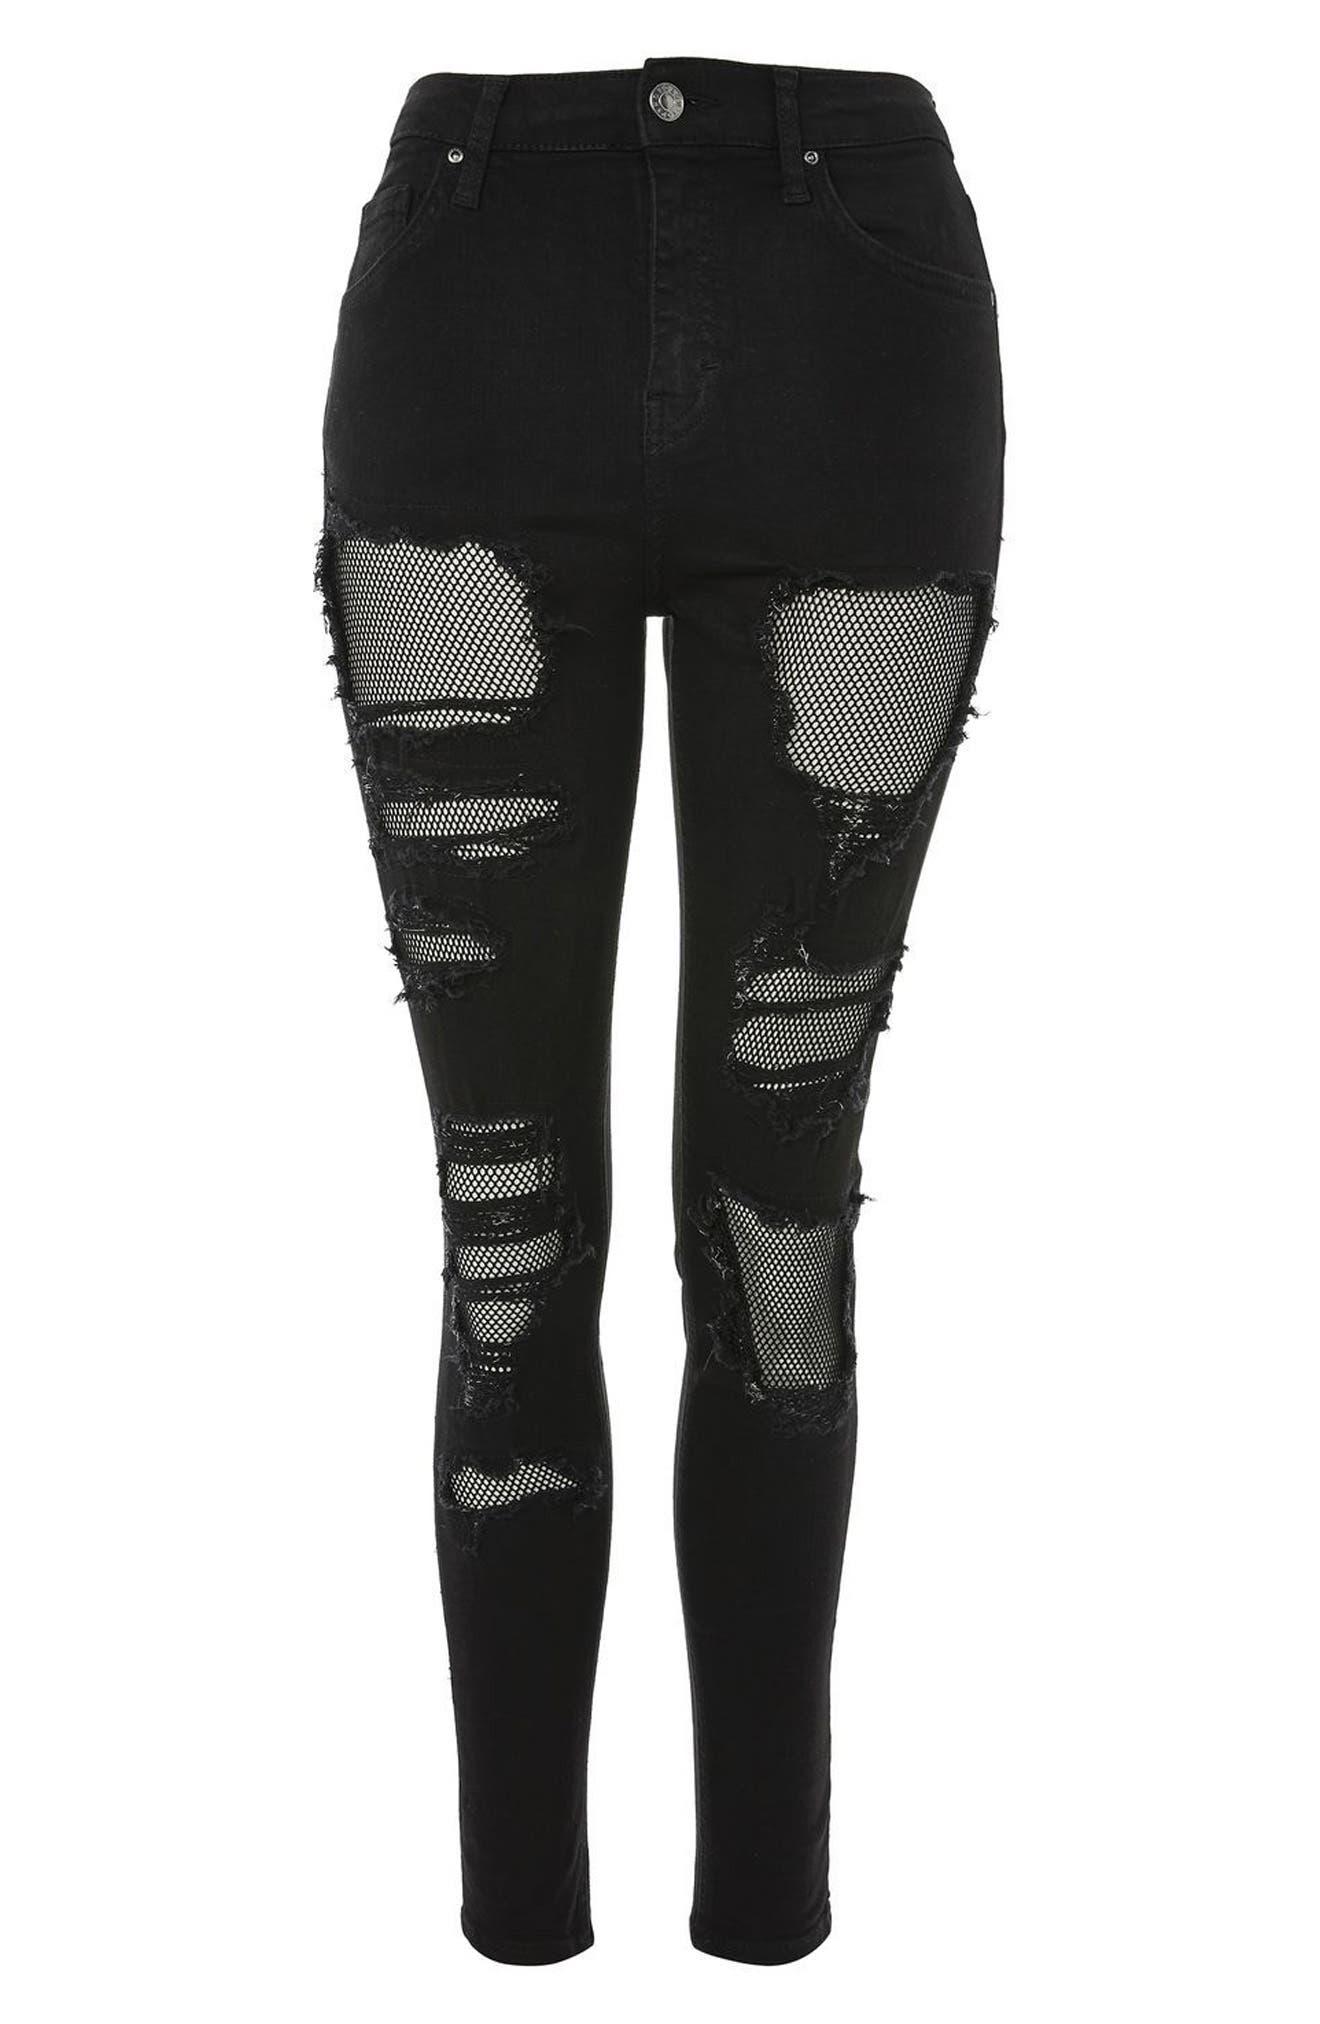 Jamie Black Fishnet Rip Skinny Jeans,                             Alternate thumbnail 3, color,                             001